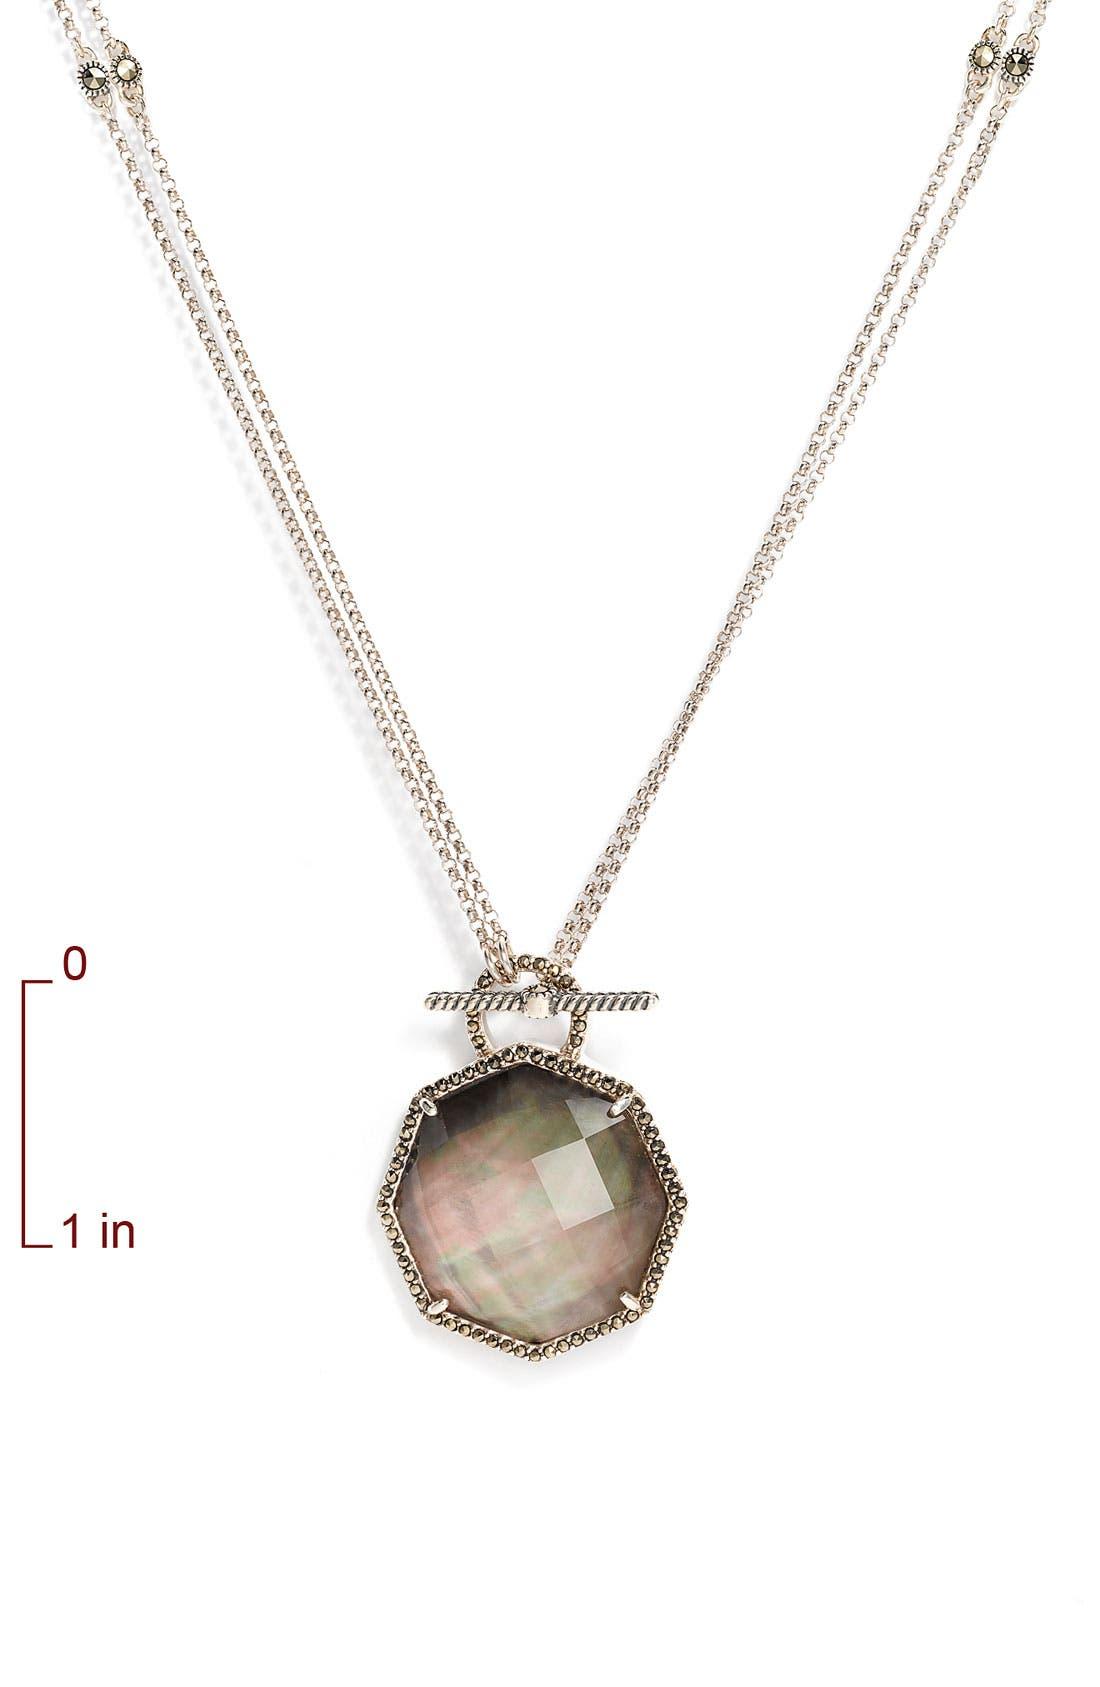 'Medallions' Semiprecious Convertible Necklace,                             Alternate thumbnail 2, color,                             001